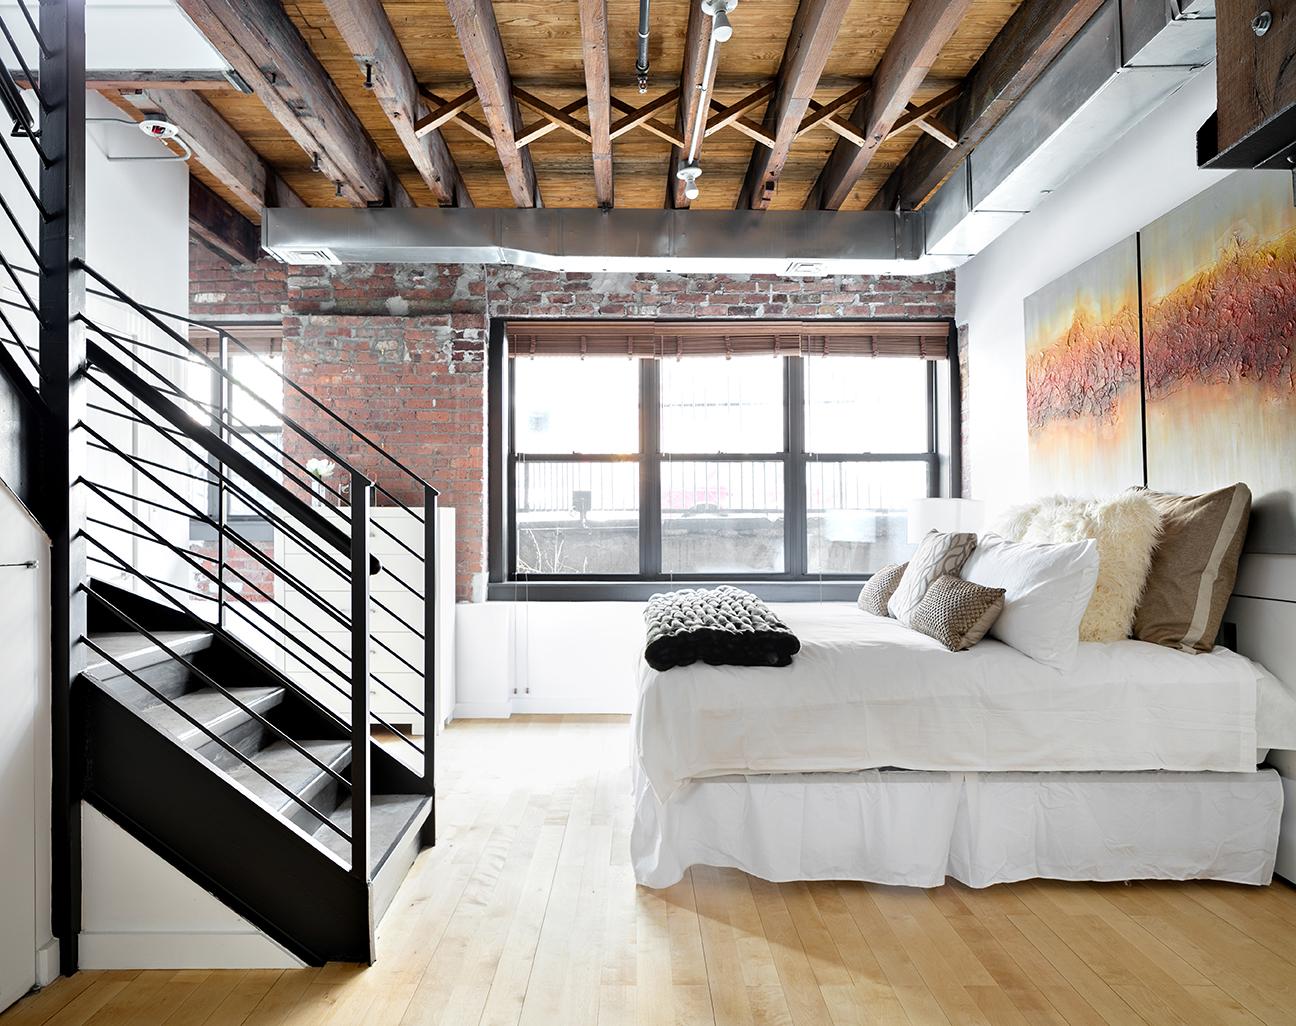 234 North 9th Street, williamsburg, bedroom, condo, loft, duplex, master bedroom